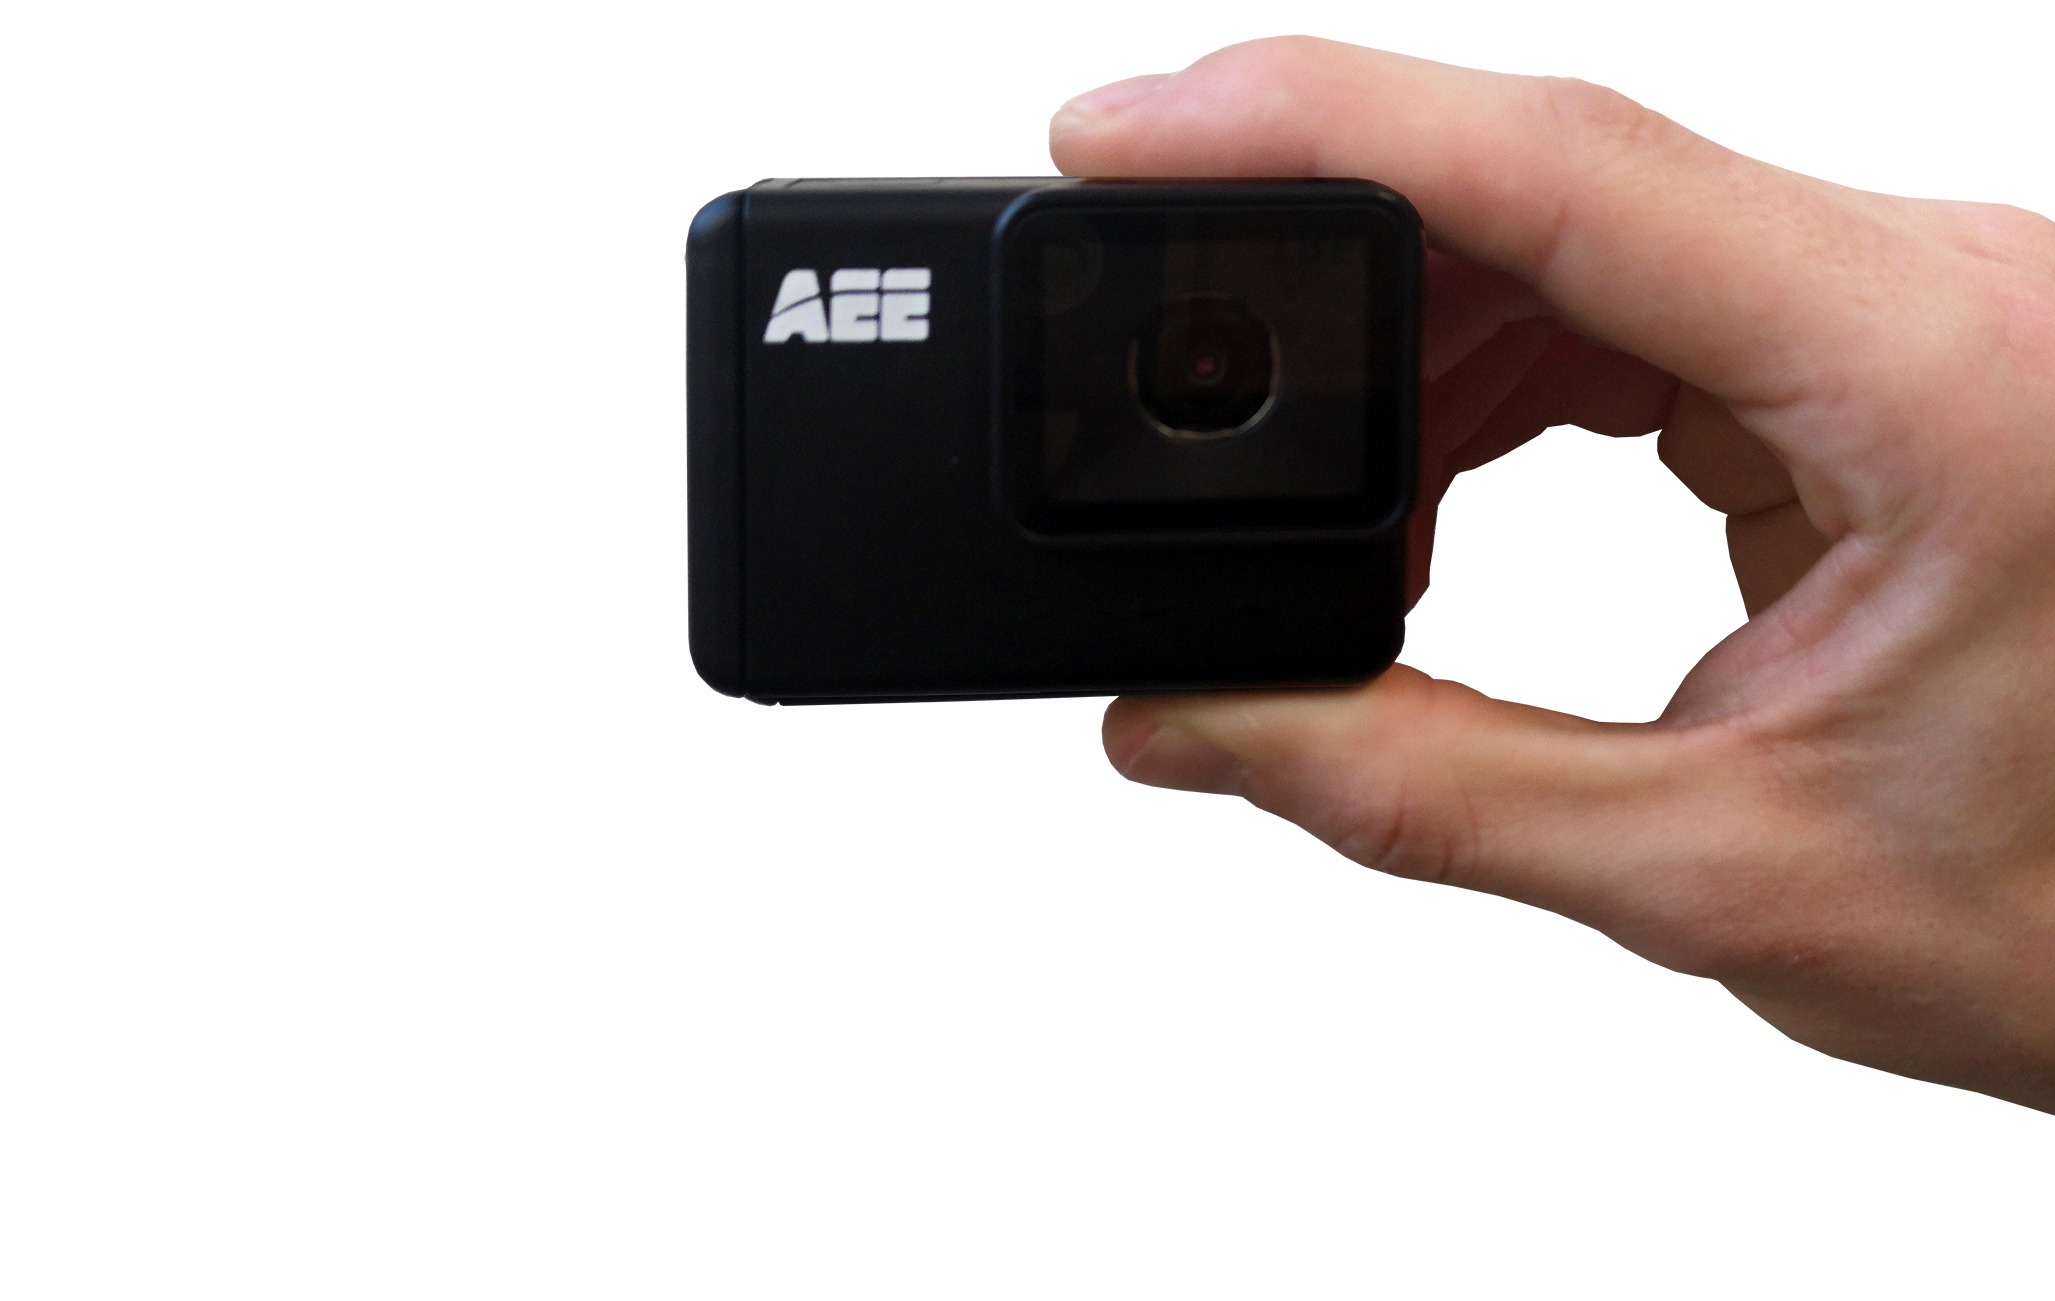 AEE innove avec un caméra embarquée munie d'un système de…